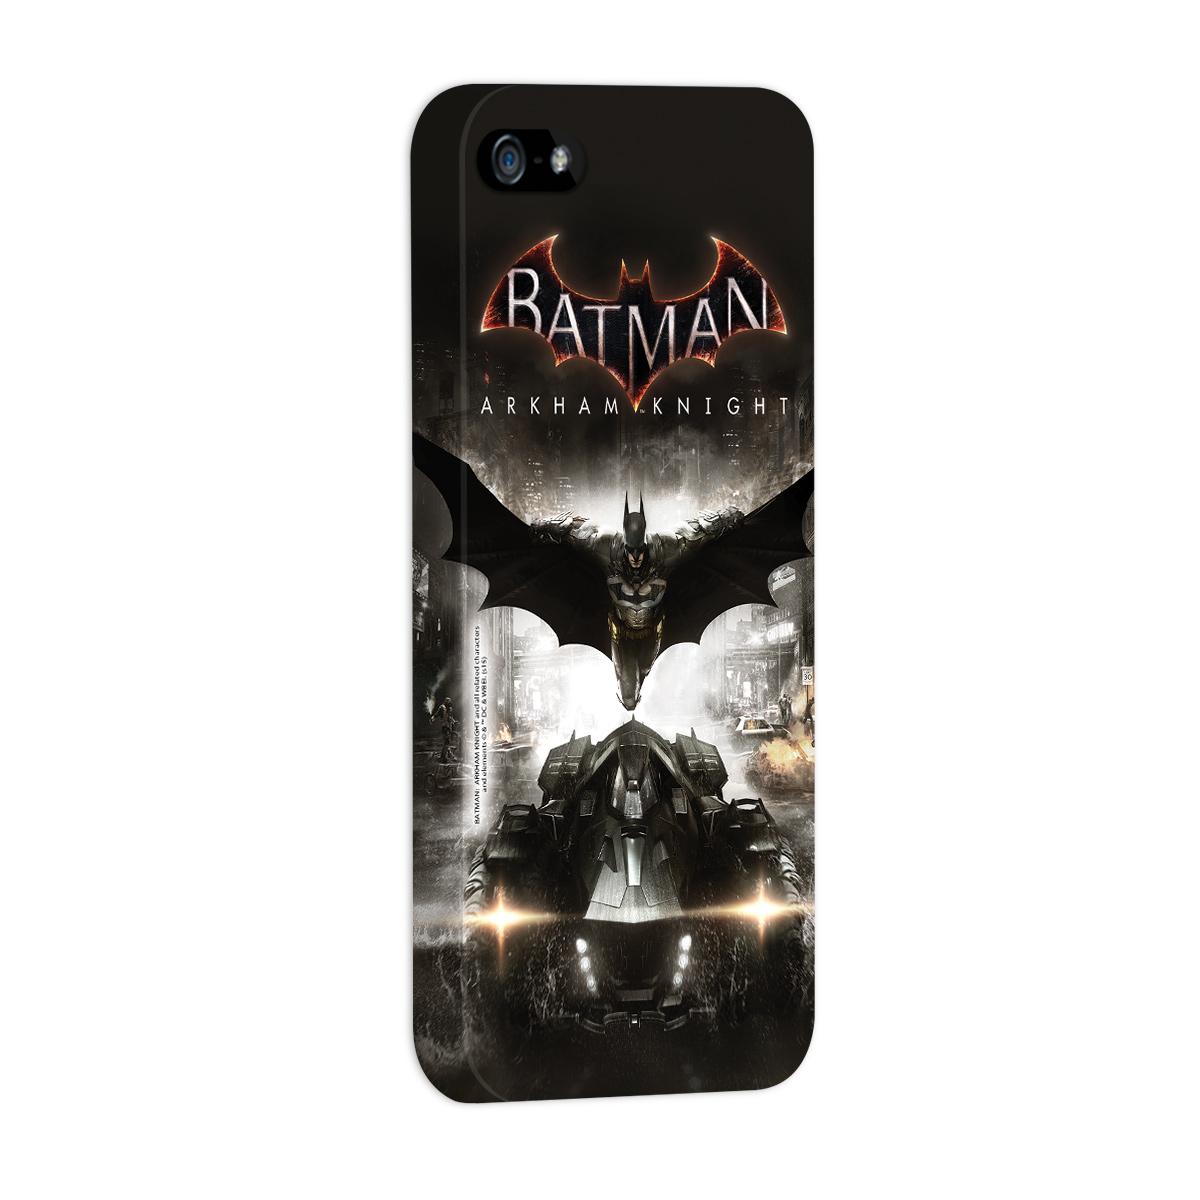 Capa para iPhone 5/5S Batman Arkham Knight Action